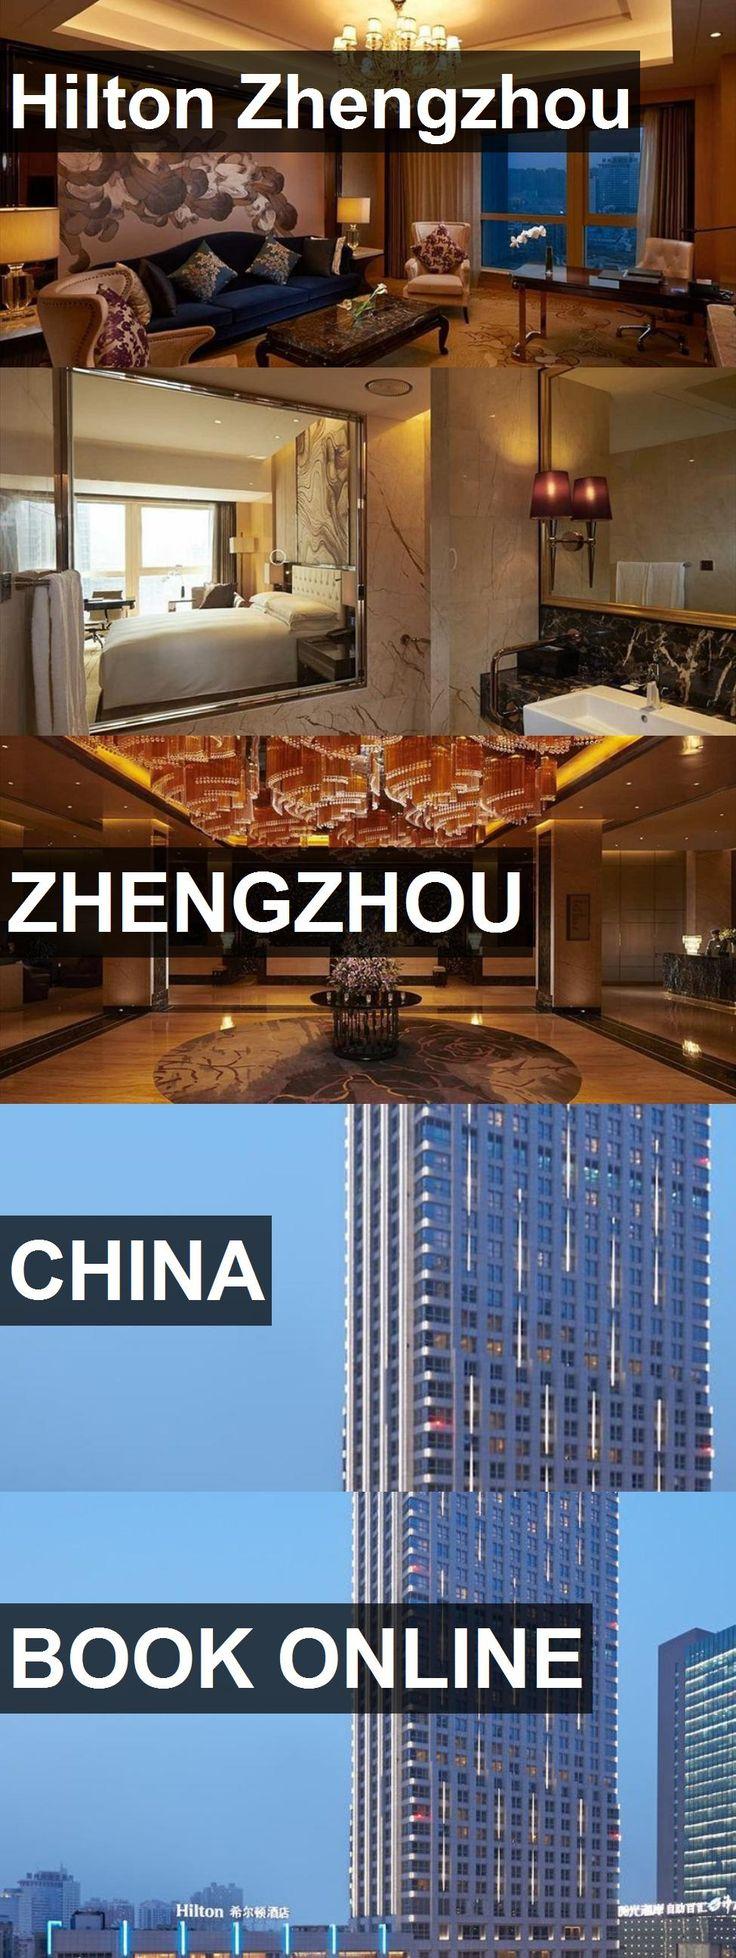 Hotel Hilton Zhengzhou in Zhengzhou, China. For more information, photos, reviews and best prices please follow the link. #China #Zhengzhou #travel #vacation #hotel